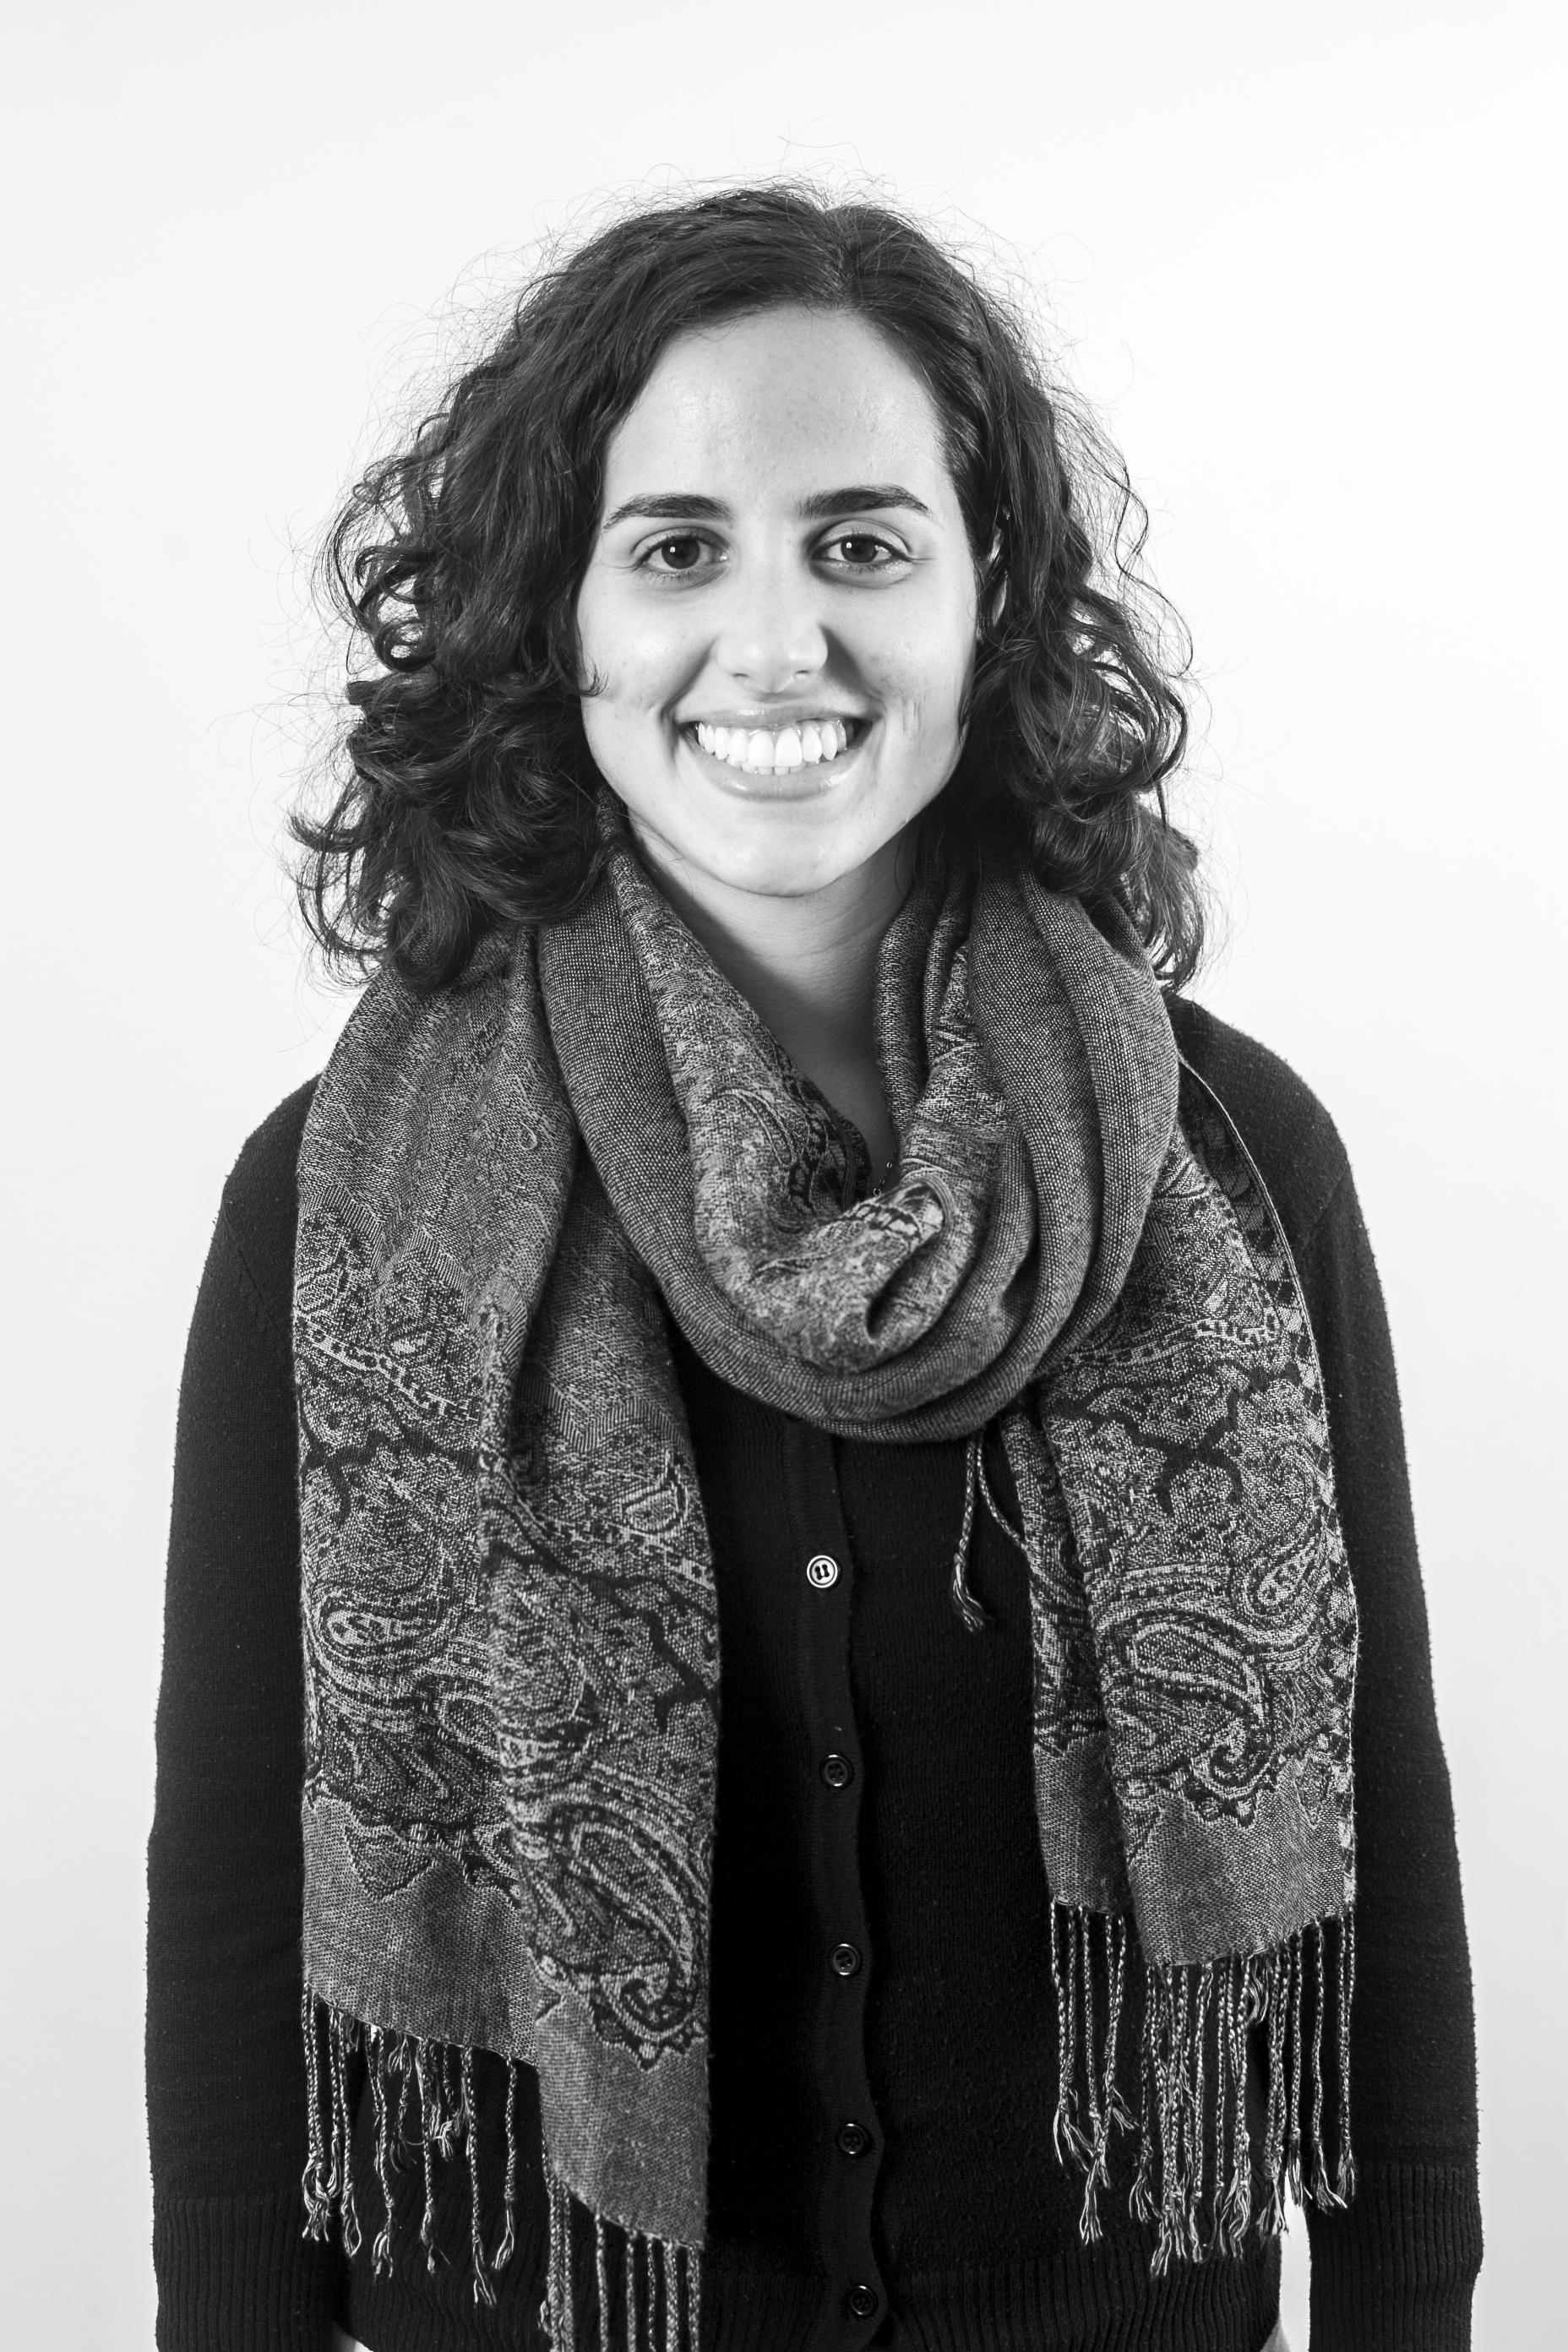 Paula Pécora de Barros